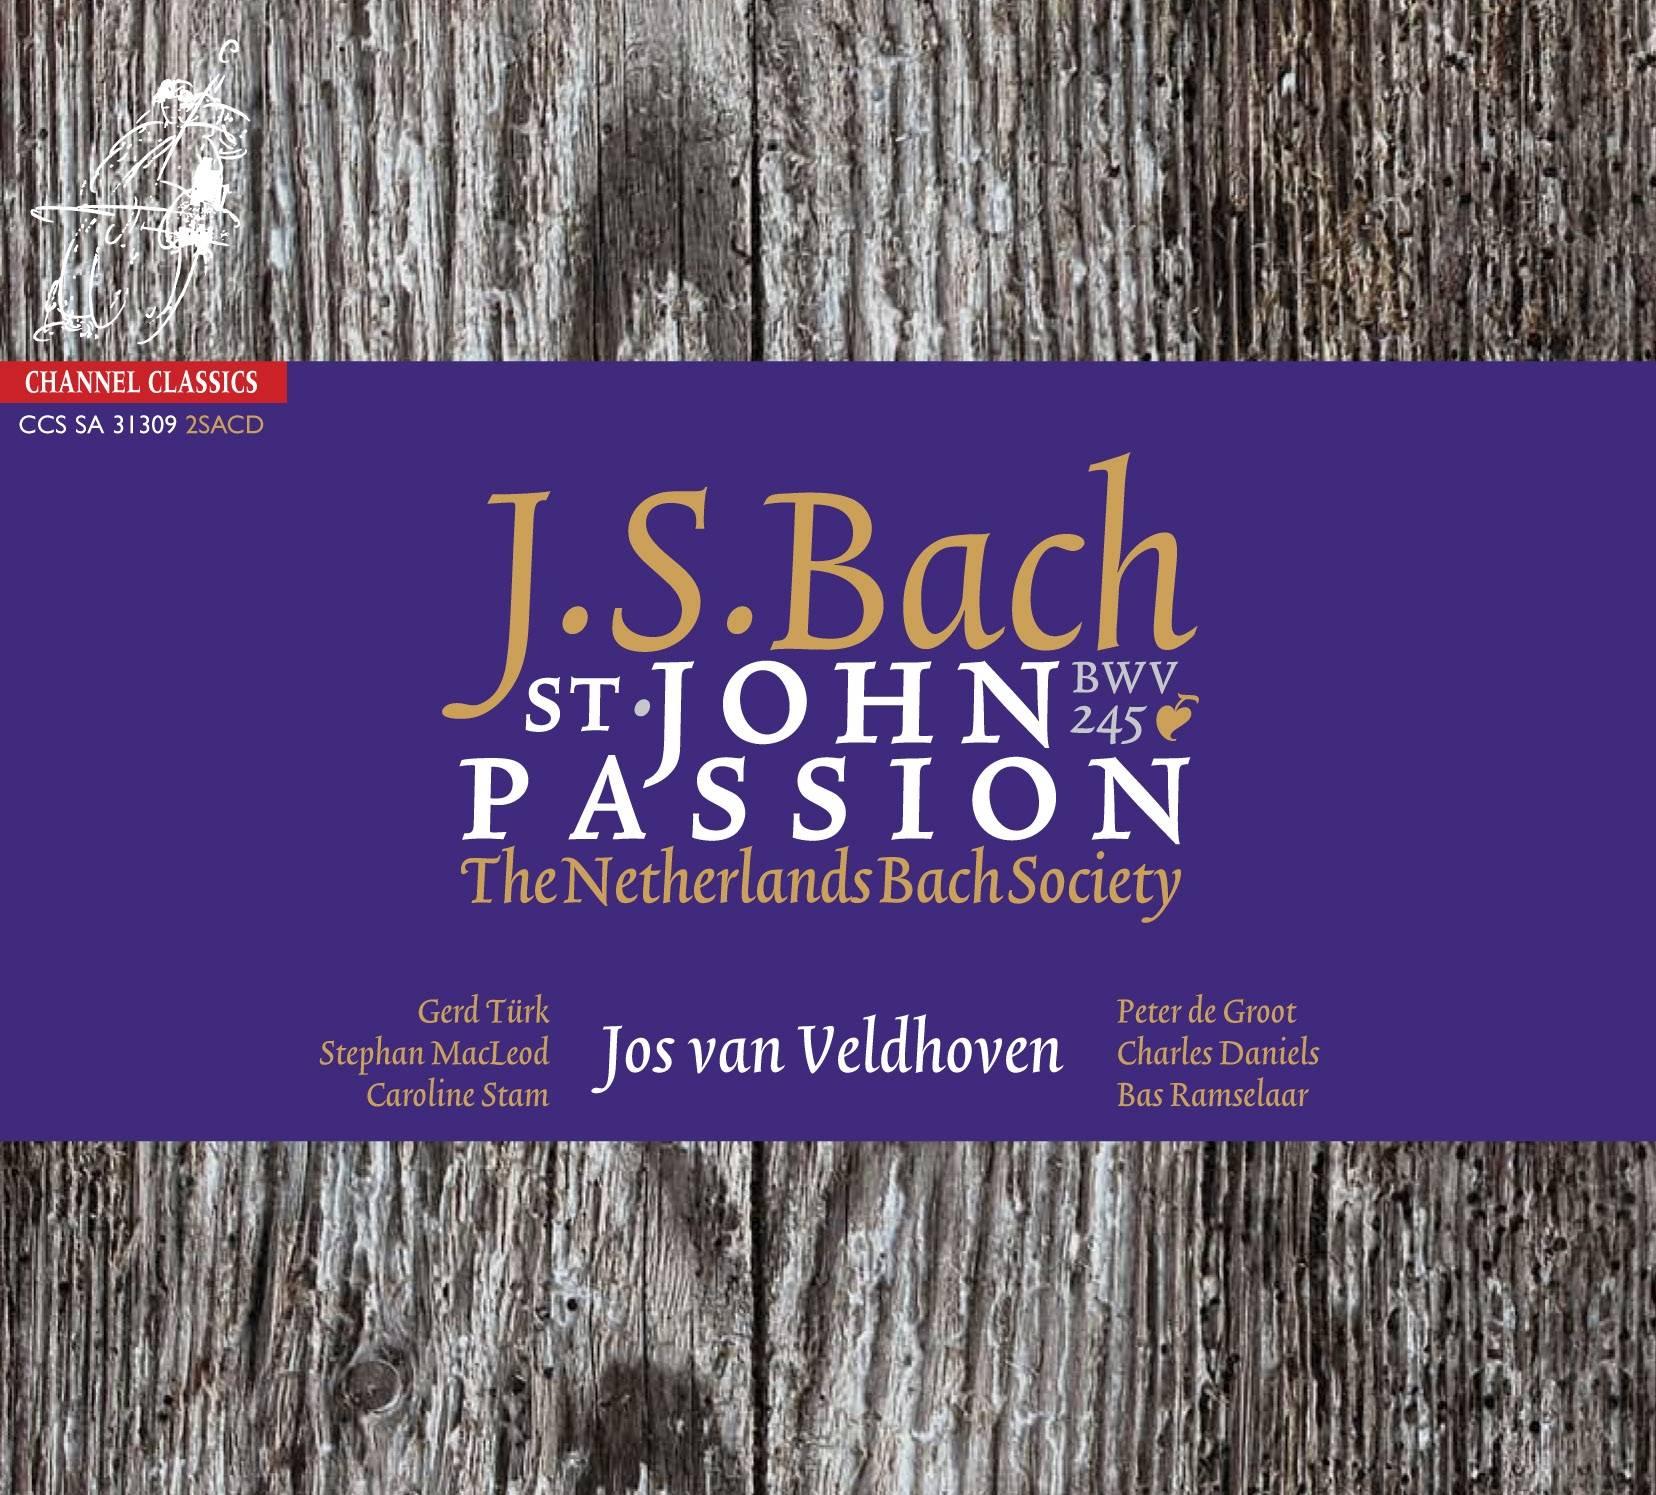 Netherlands Bach Society, Jos Van Veldhoven - JS Bach: St. John Passion v.1724 (2005/2009) [DSD64 + Hi-Res FLAC]